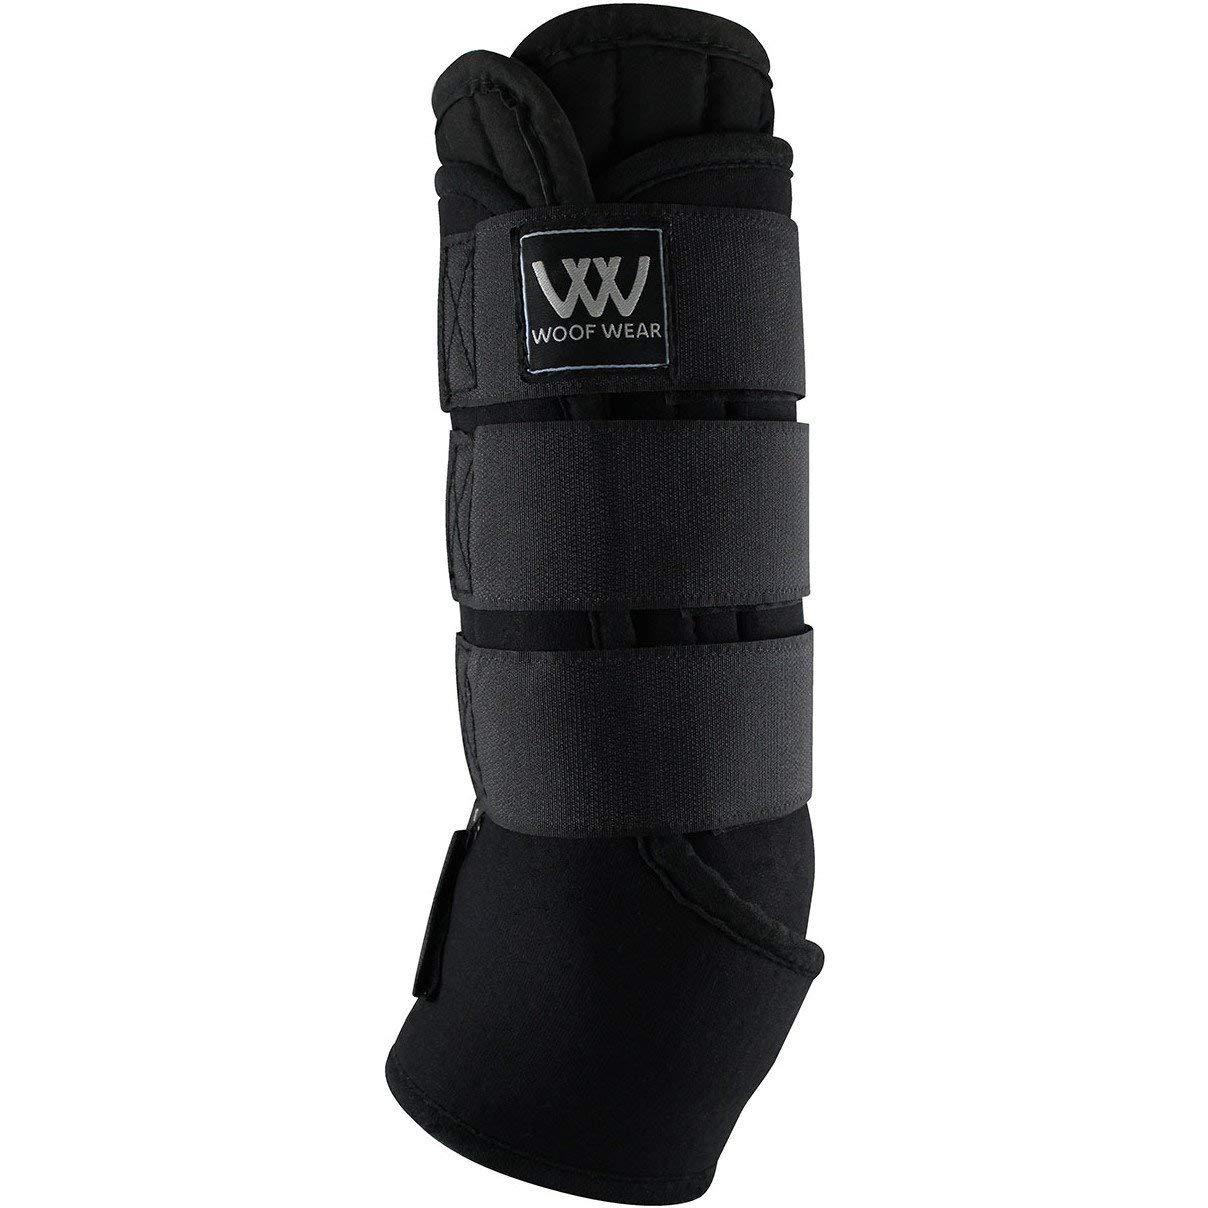 Woof Wear Wickingライナー安定チャップスX Largeブラック   B076WLPX2J